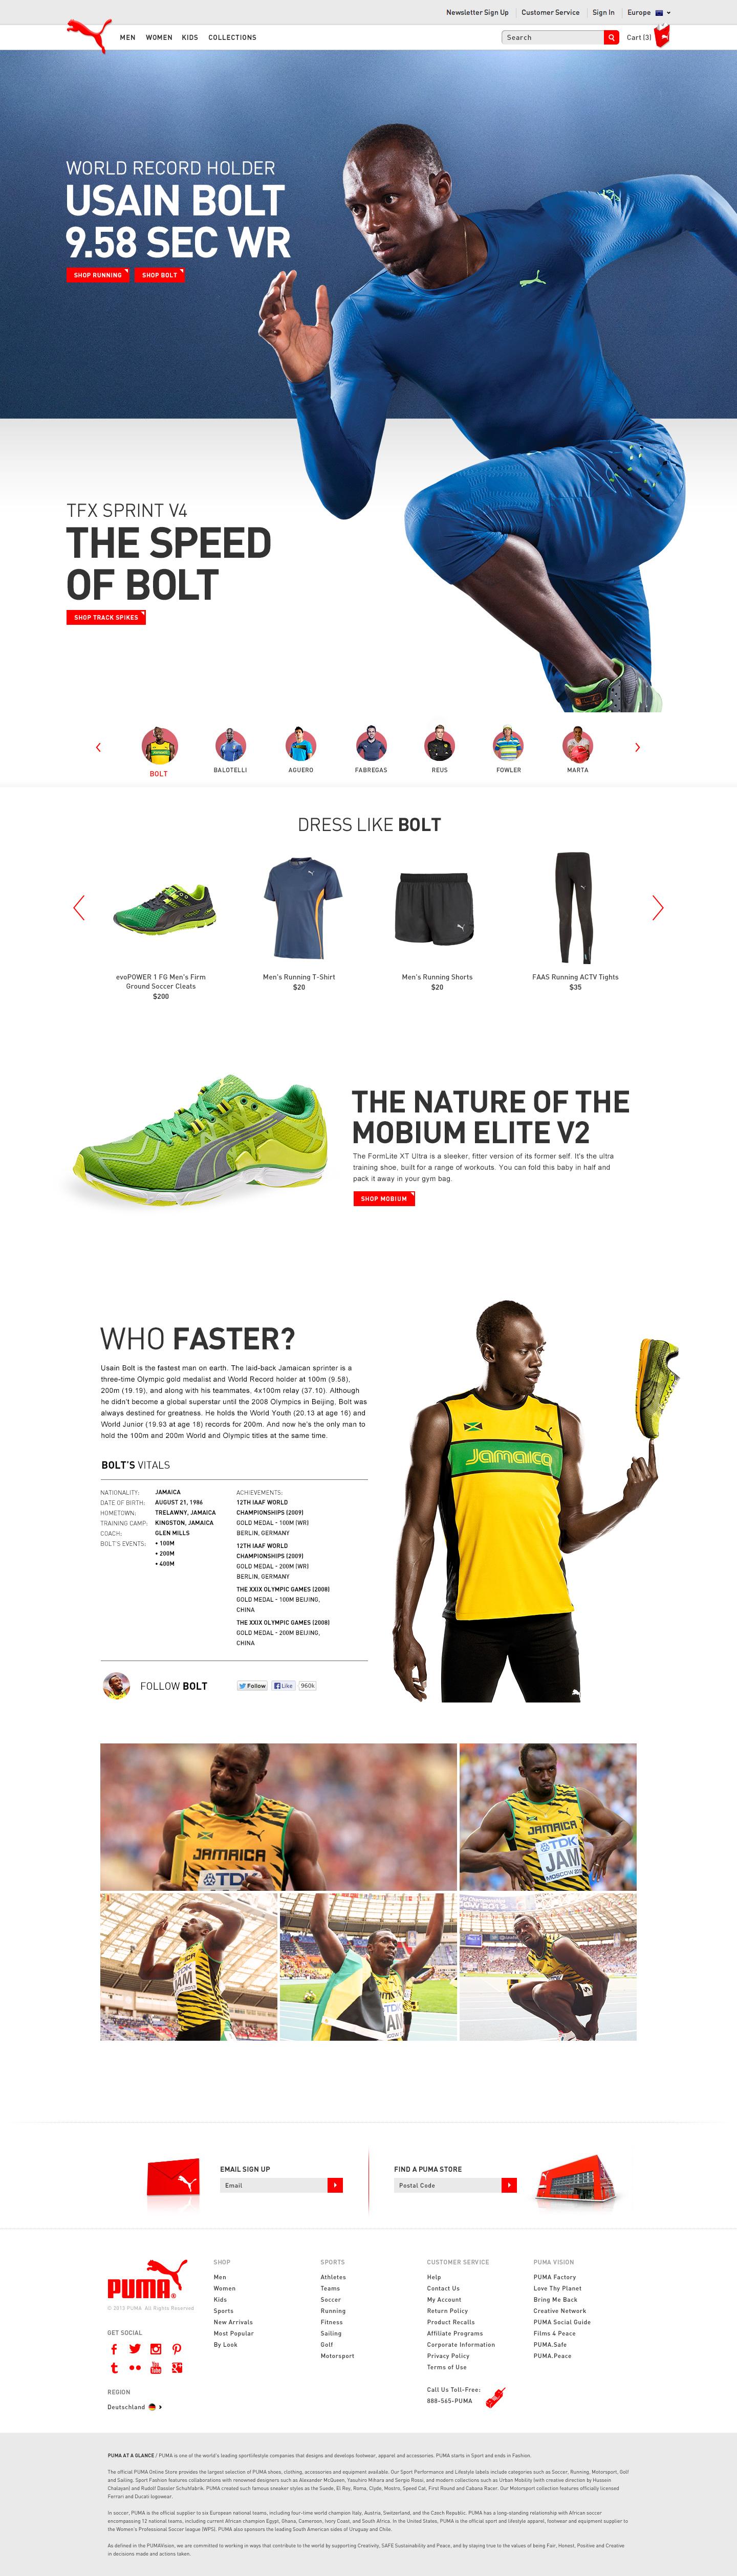 Puma_Athlete-Bolt_0307_1.jpg